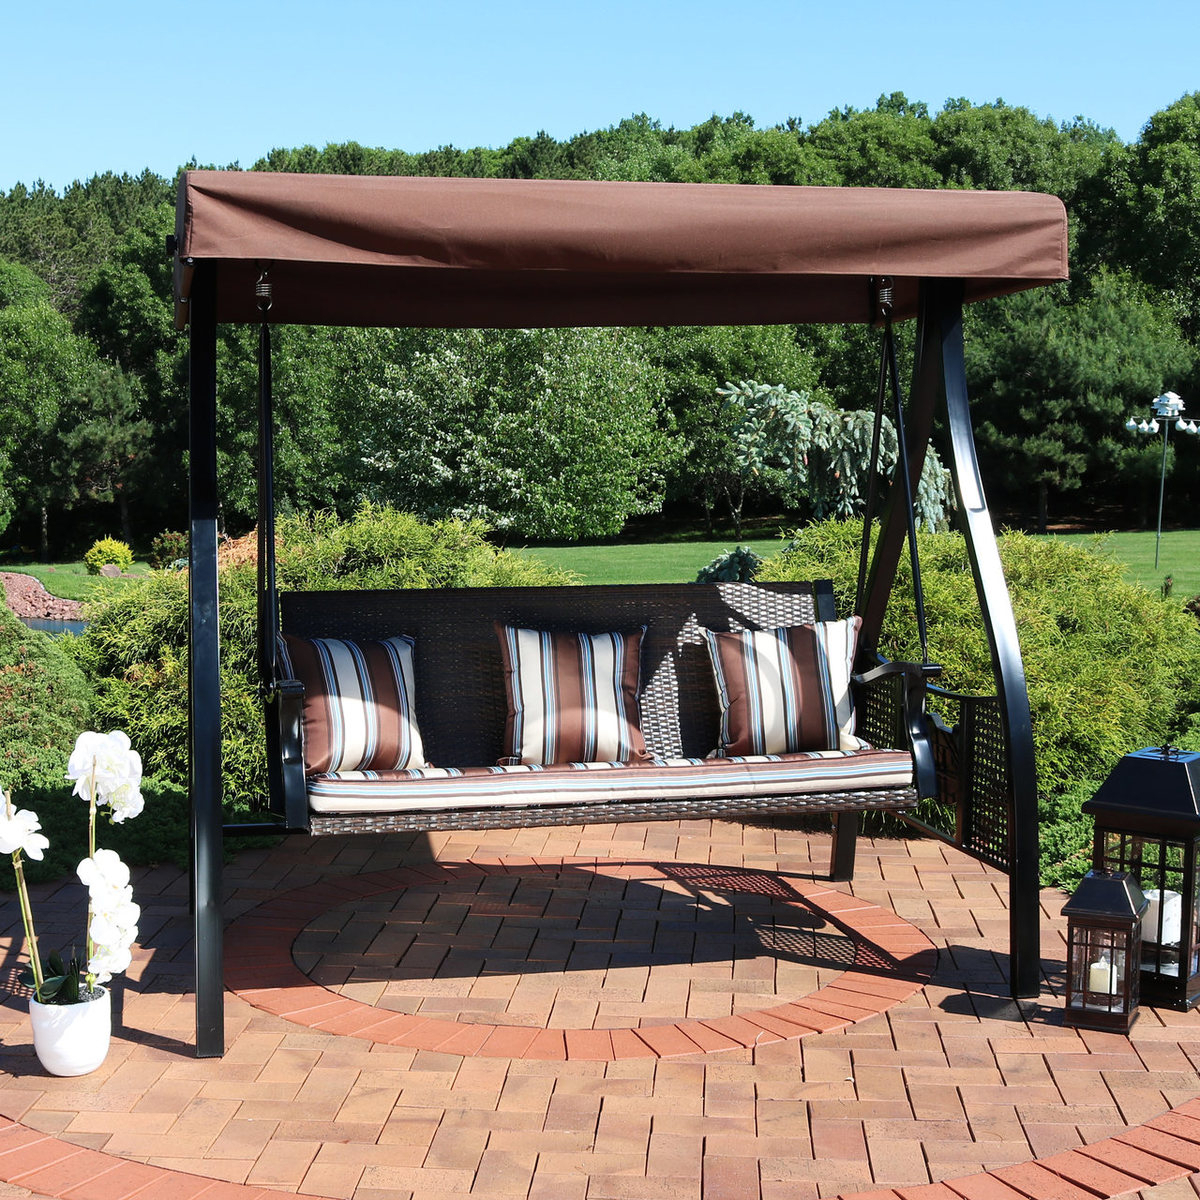 Home & Garden Patio Swing Adjustable Canopy Steel Frame Gray Regarding Patio Gazebo Porch Swings (View 9 of 25)